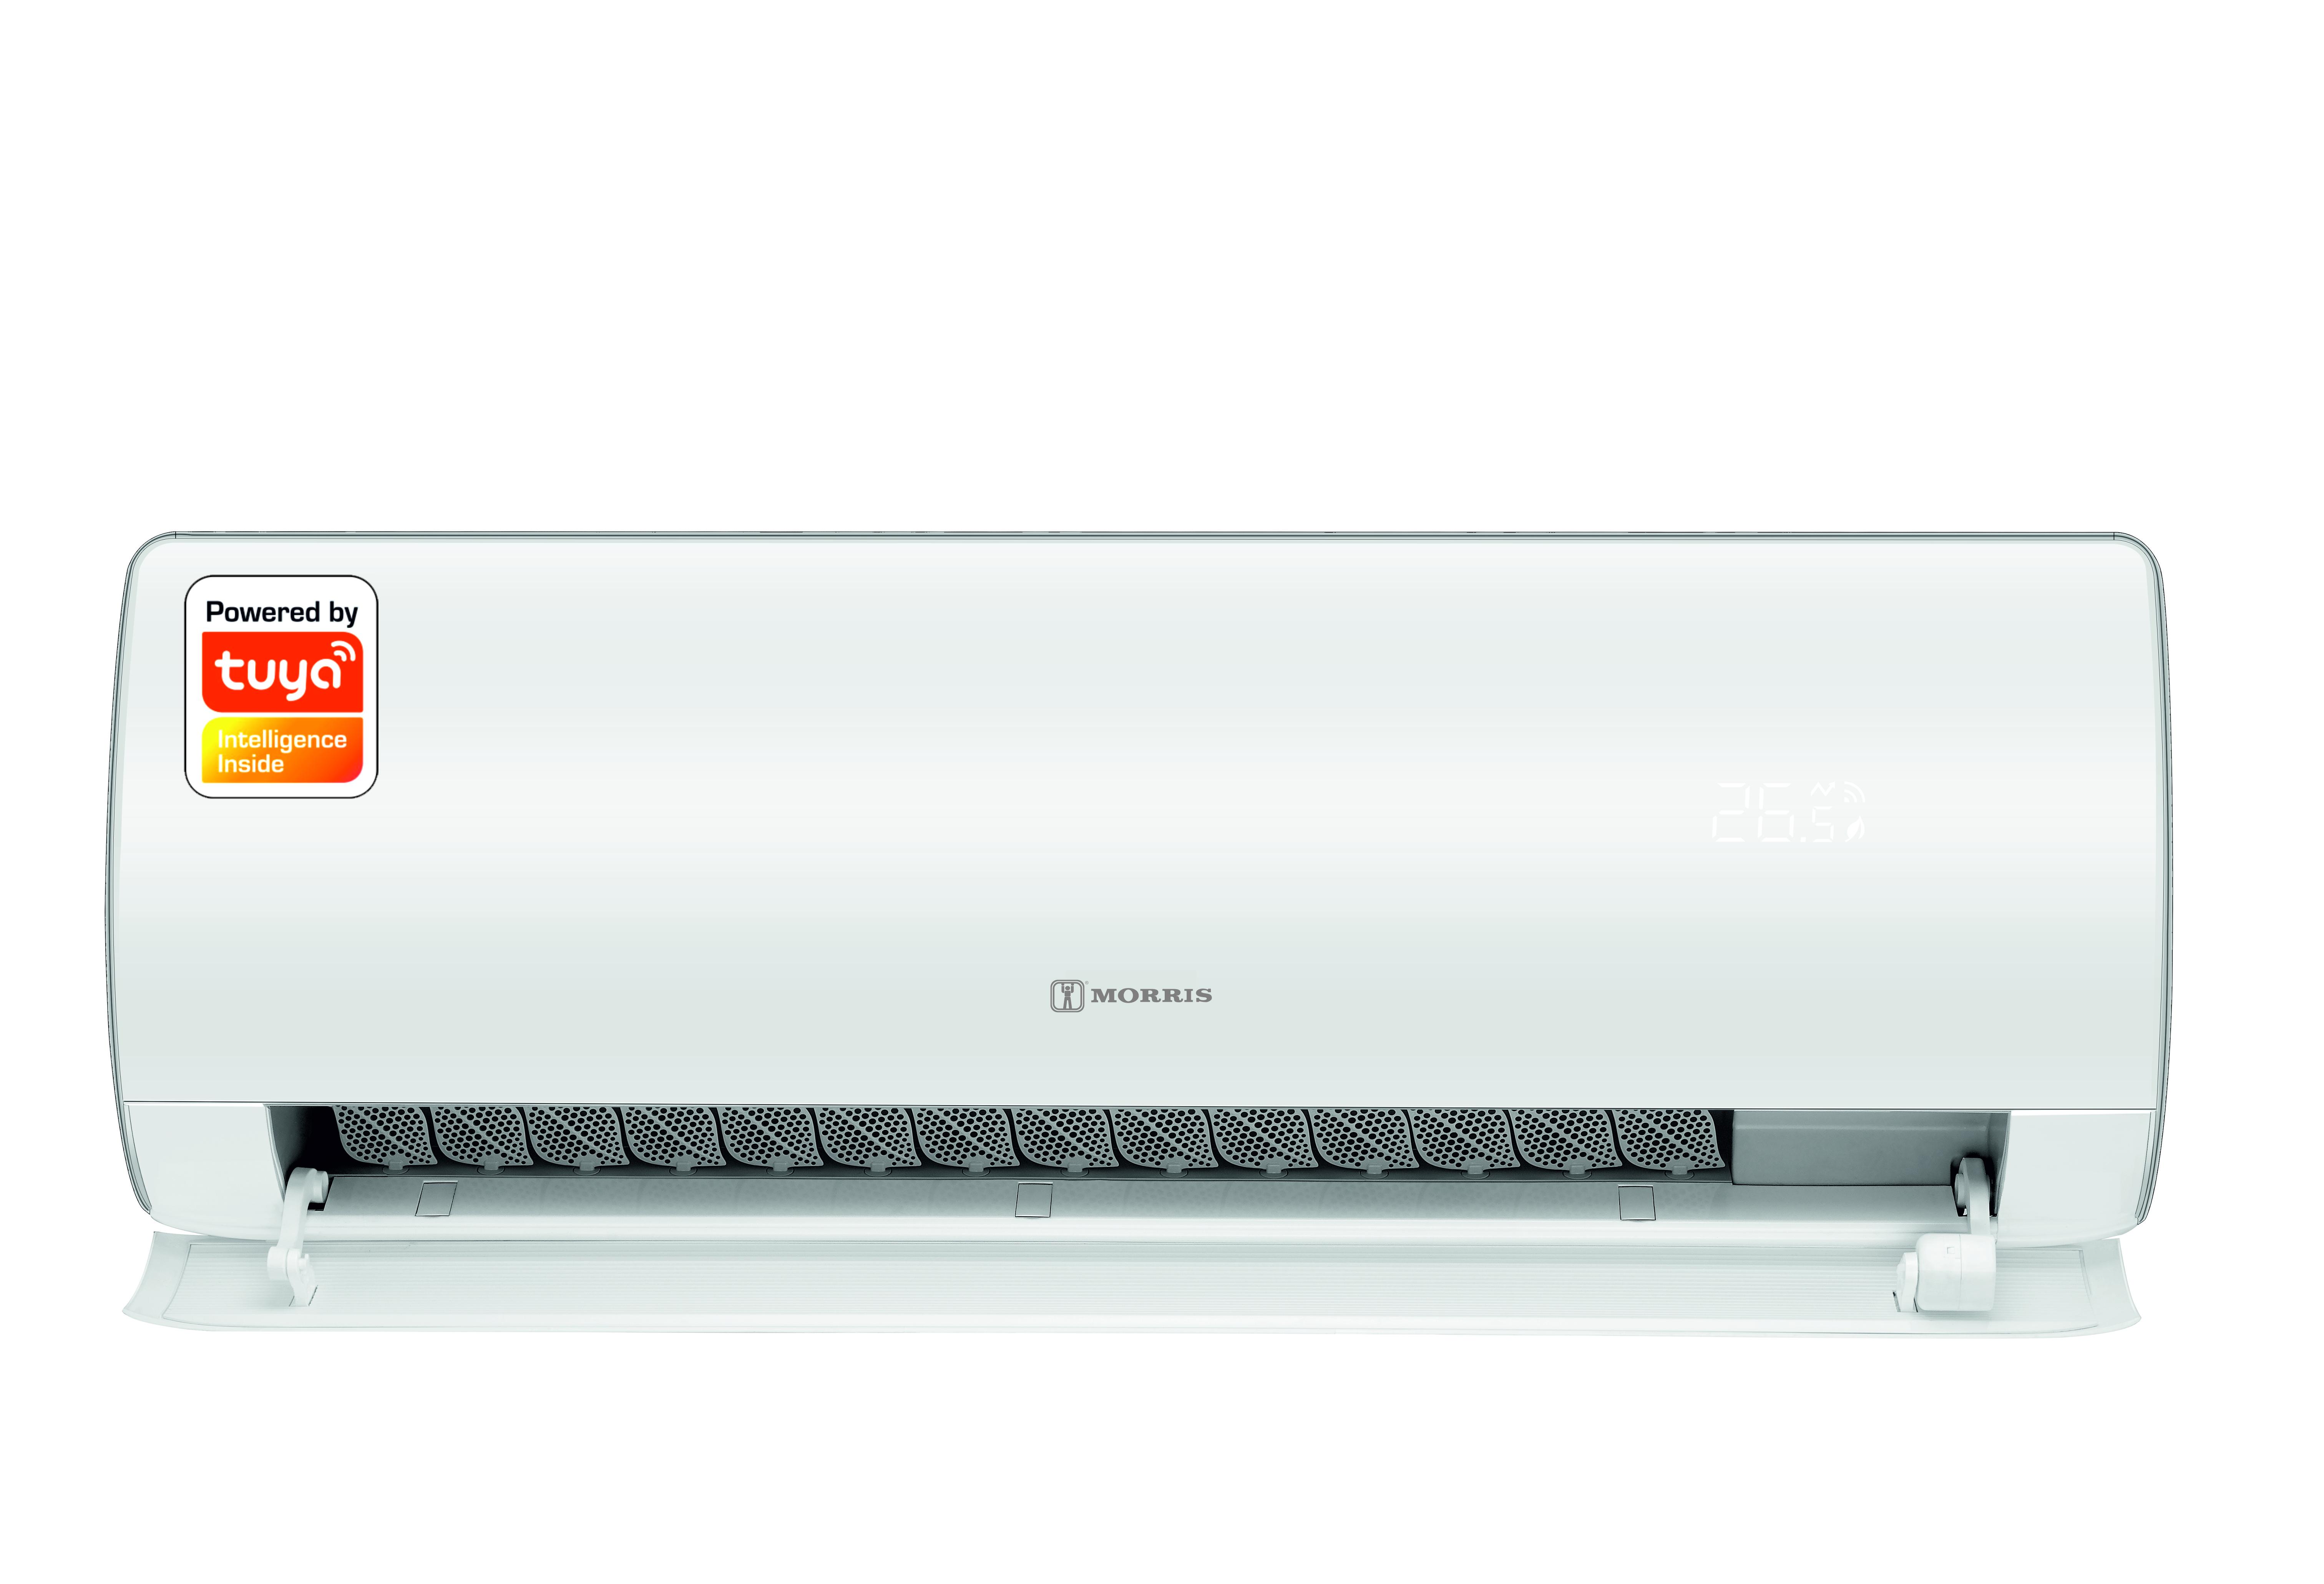 MORRIS WFIN-35150 ΚΛΙΜΑΤΙΣΤΙΚΟ Smart WiFi INVERTER 12000BTU